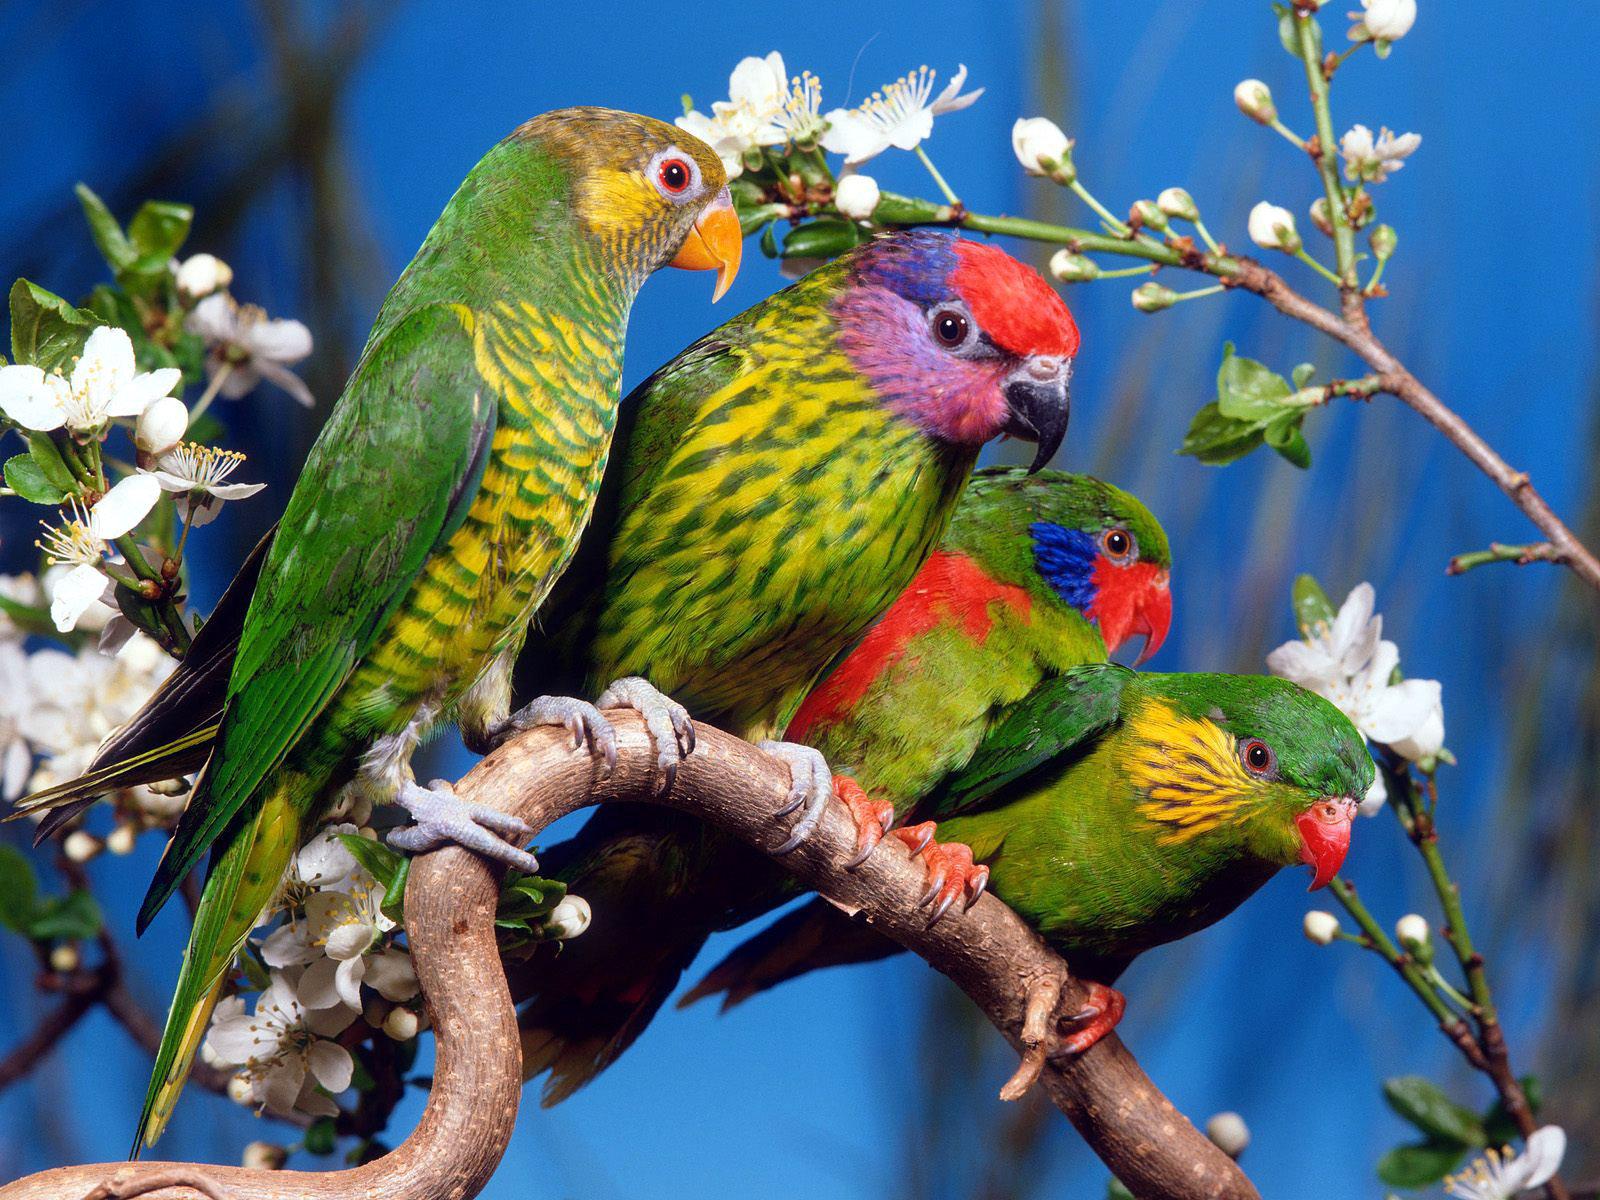 http://3.bp.blogspot.com/-IsT0712hPuQ/Tka_JHixeMI/AAAAAAAACGI/QAEUecBuv5o/s1600/four_green_birds_wallpaper.jpg